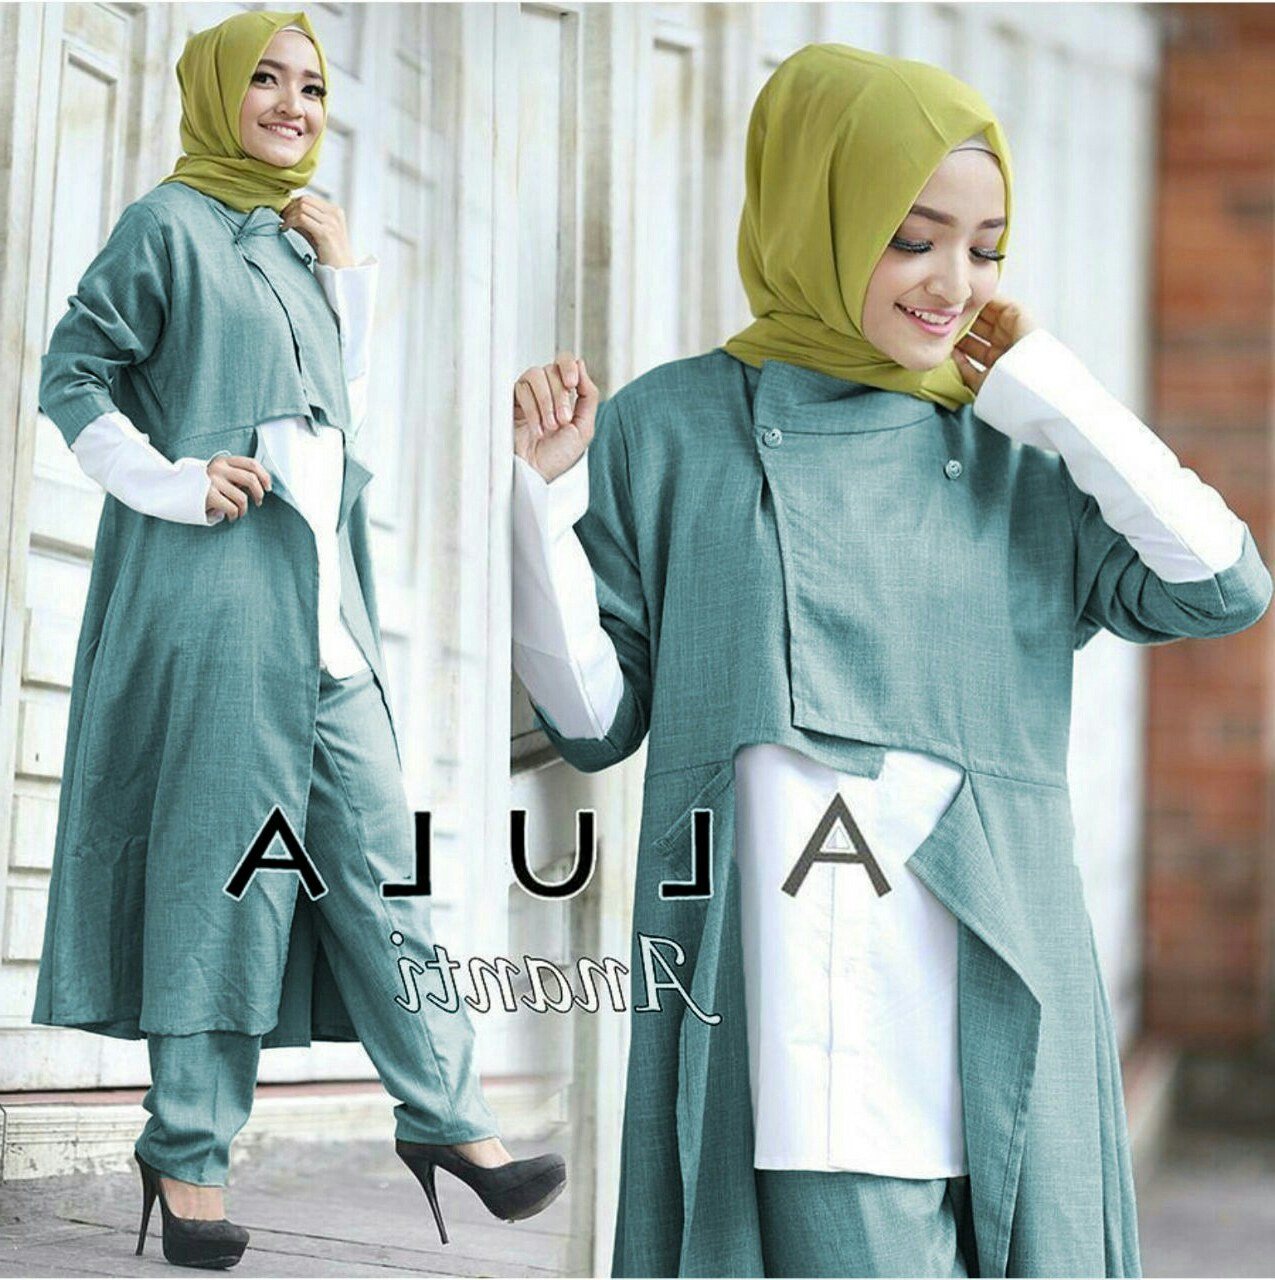 Design Baju Lebaran Wanita Dewasa S1du Baju Setelan Hijab Celana Wanita Dewasa Modis Murah